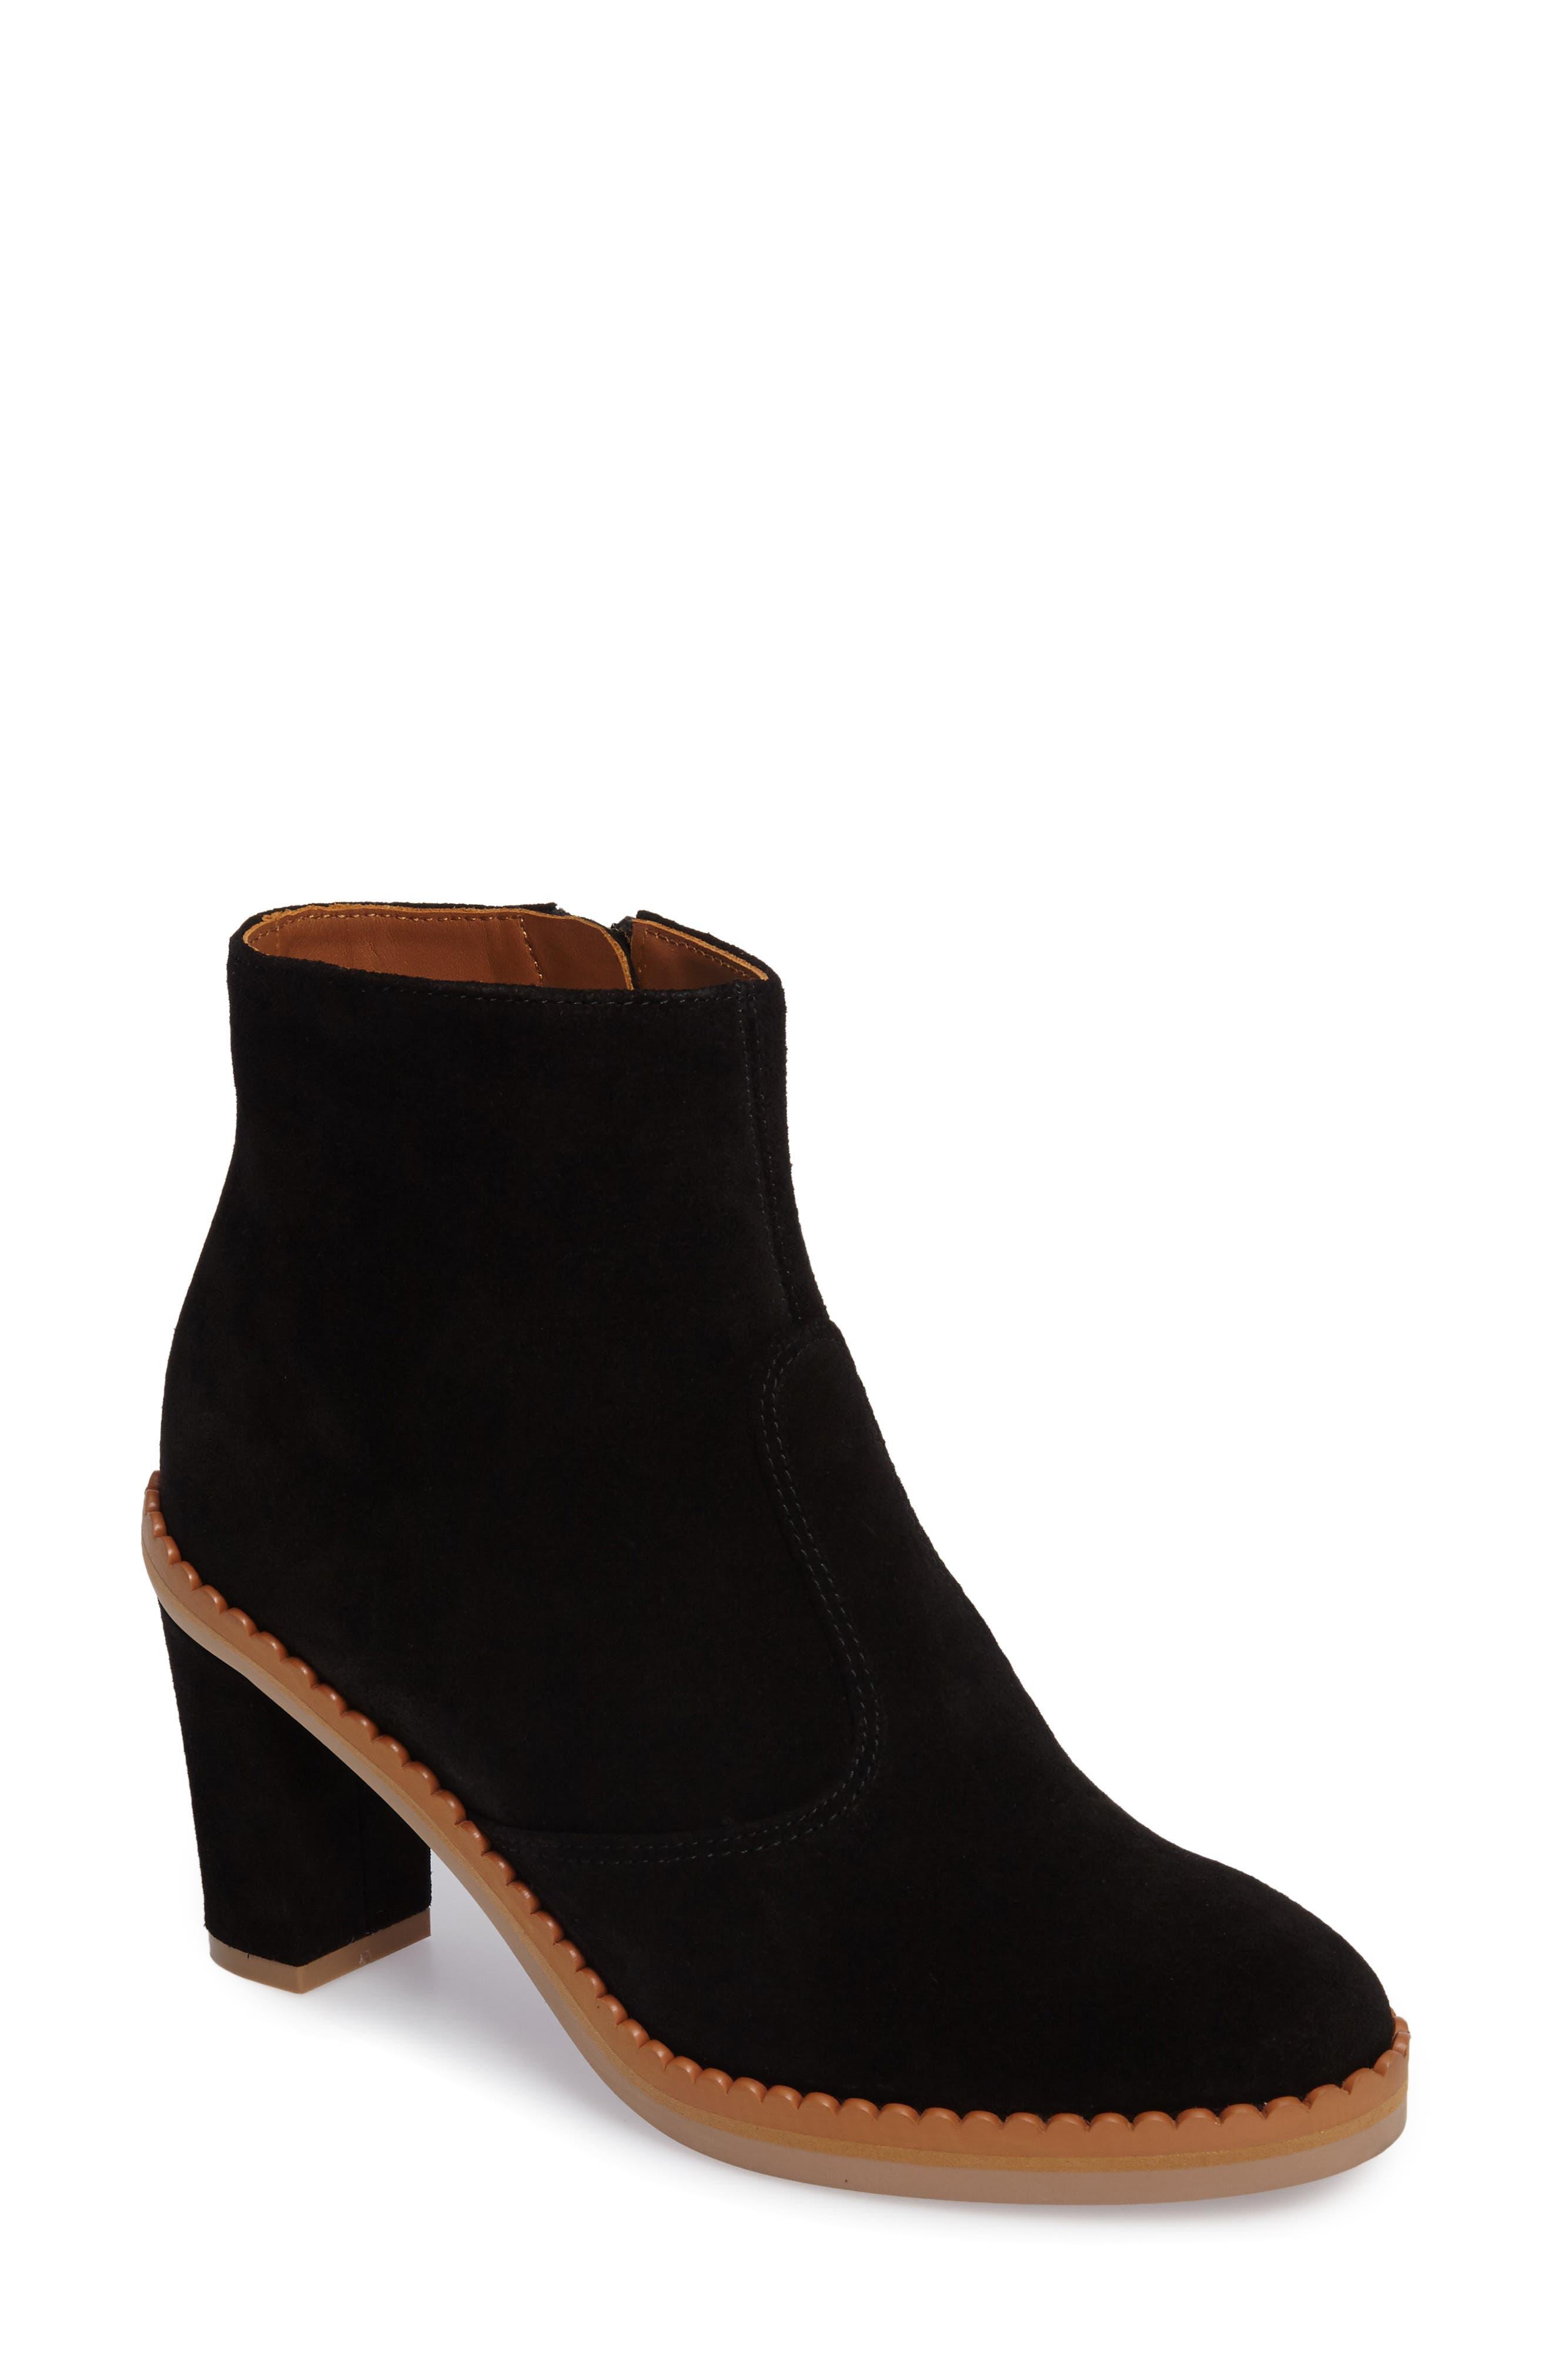 See by Chloé Stasya Block Heel Bootie (Women)